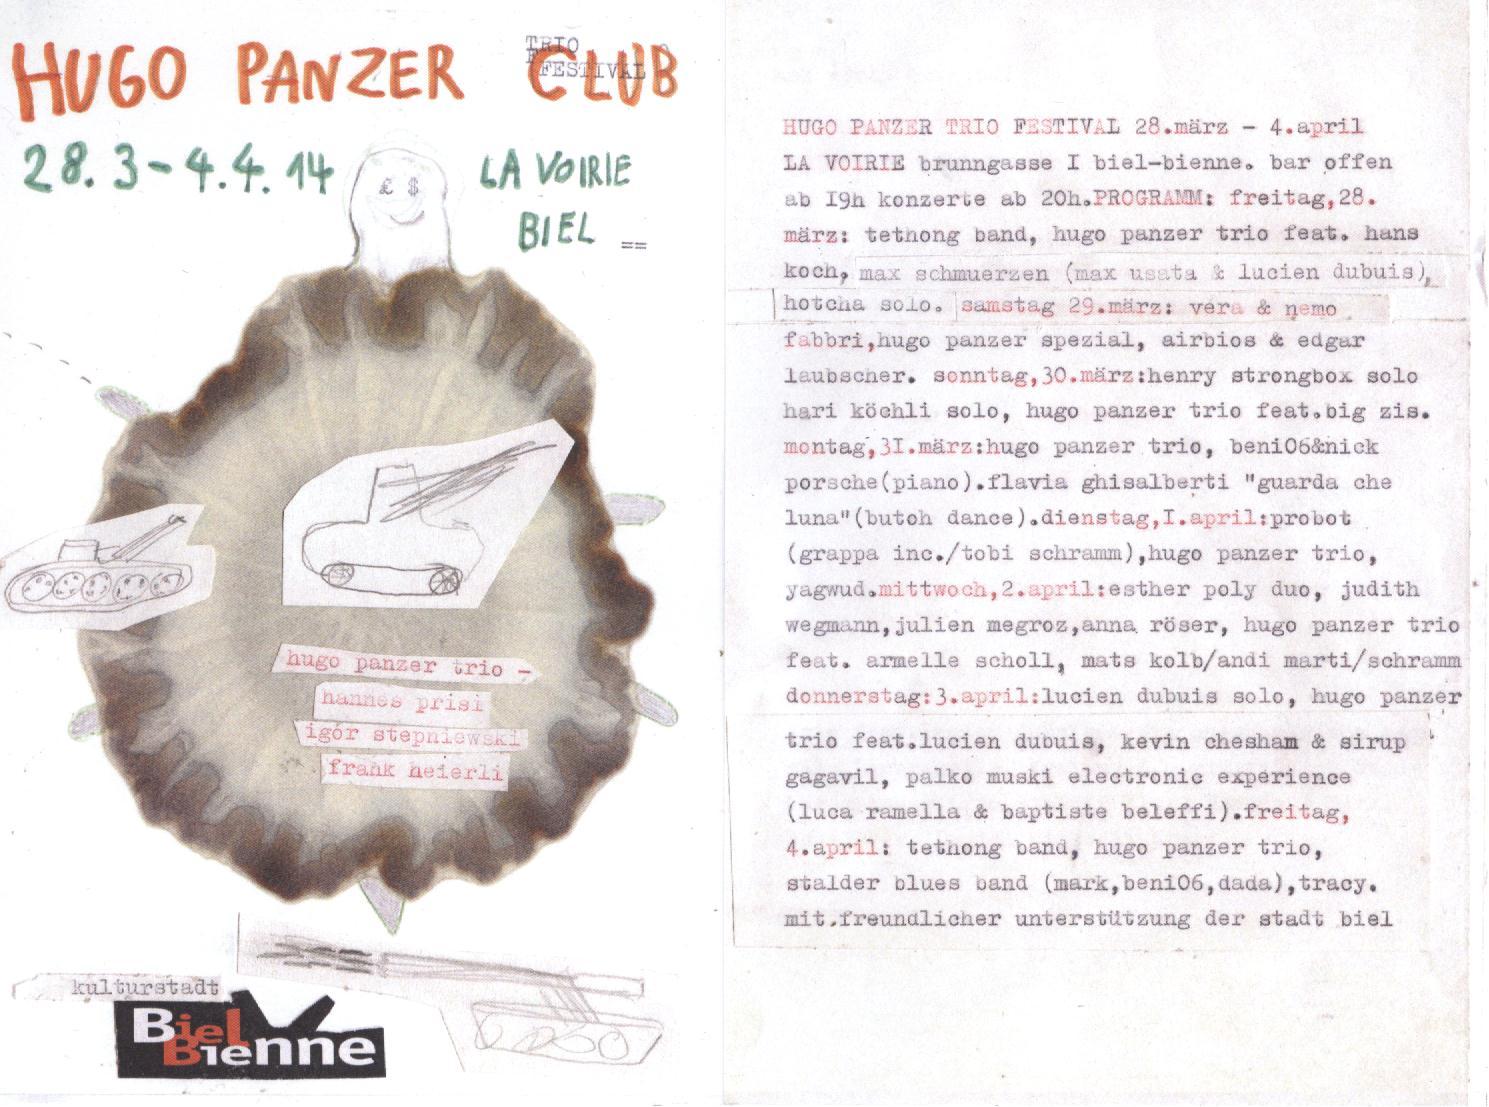 Hugo Panzer Festival - der Flyer